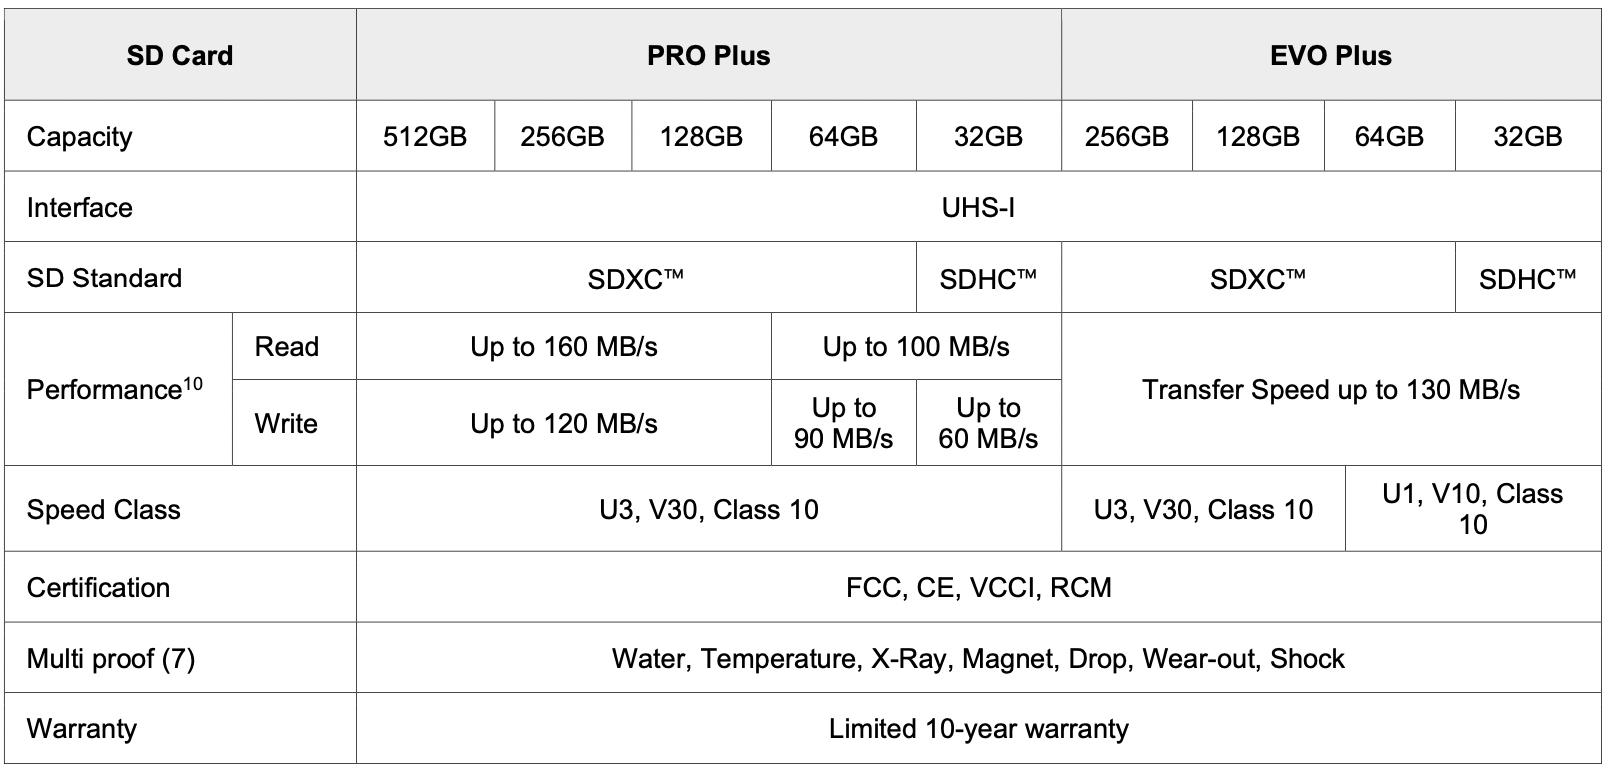 Samsung PRO Plus 512GB microSD Card Review - Storage 12